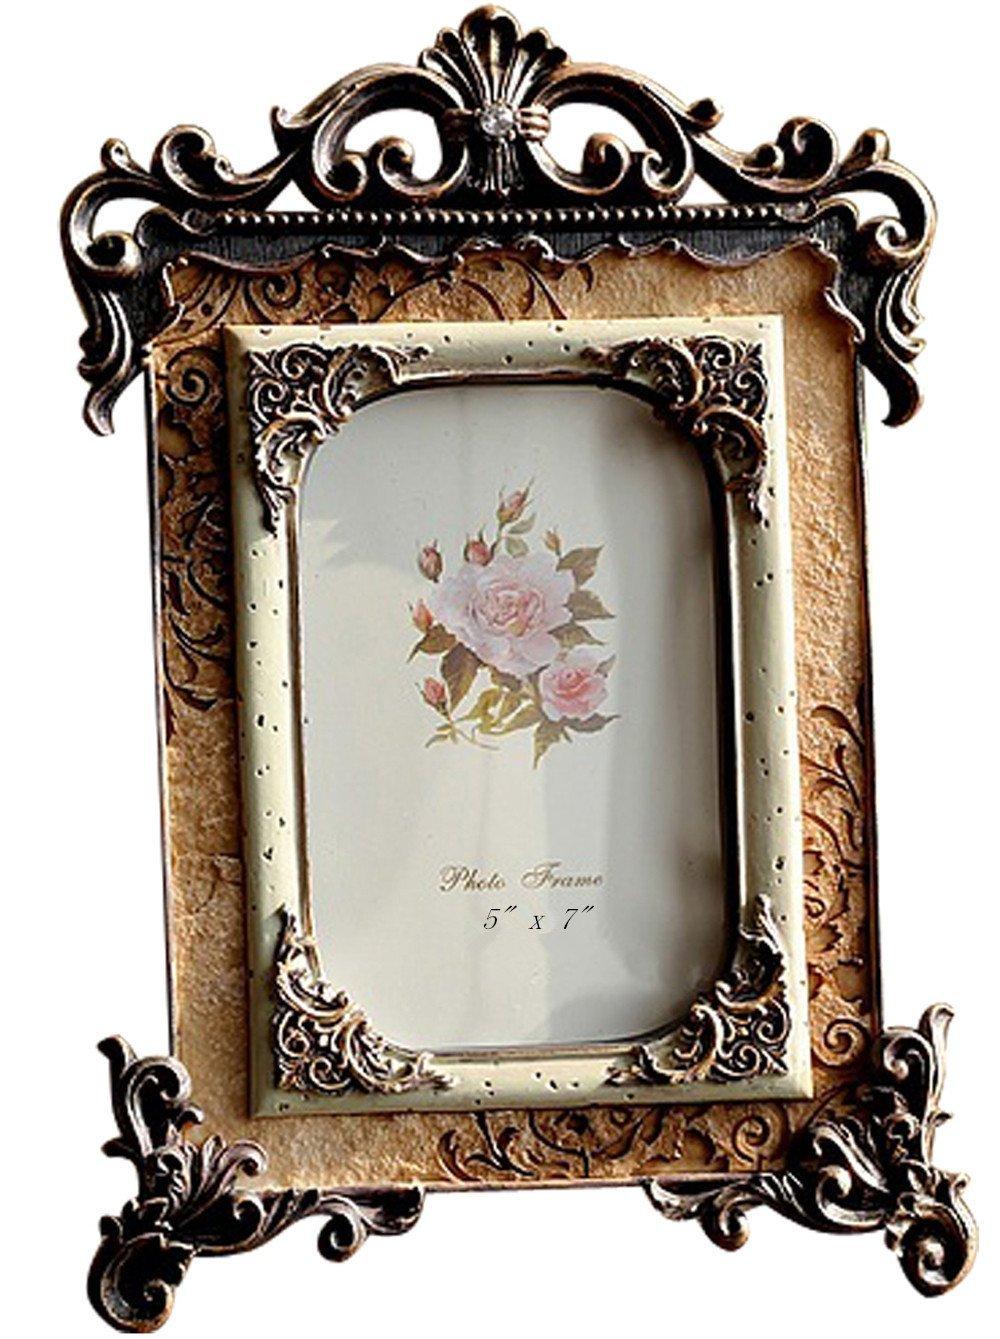 Giftgarden 5x7 Vintage Golden Picture Frames European ...